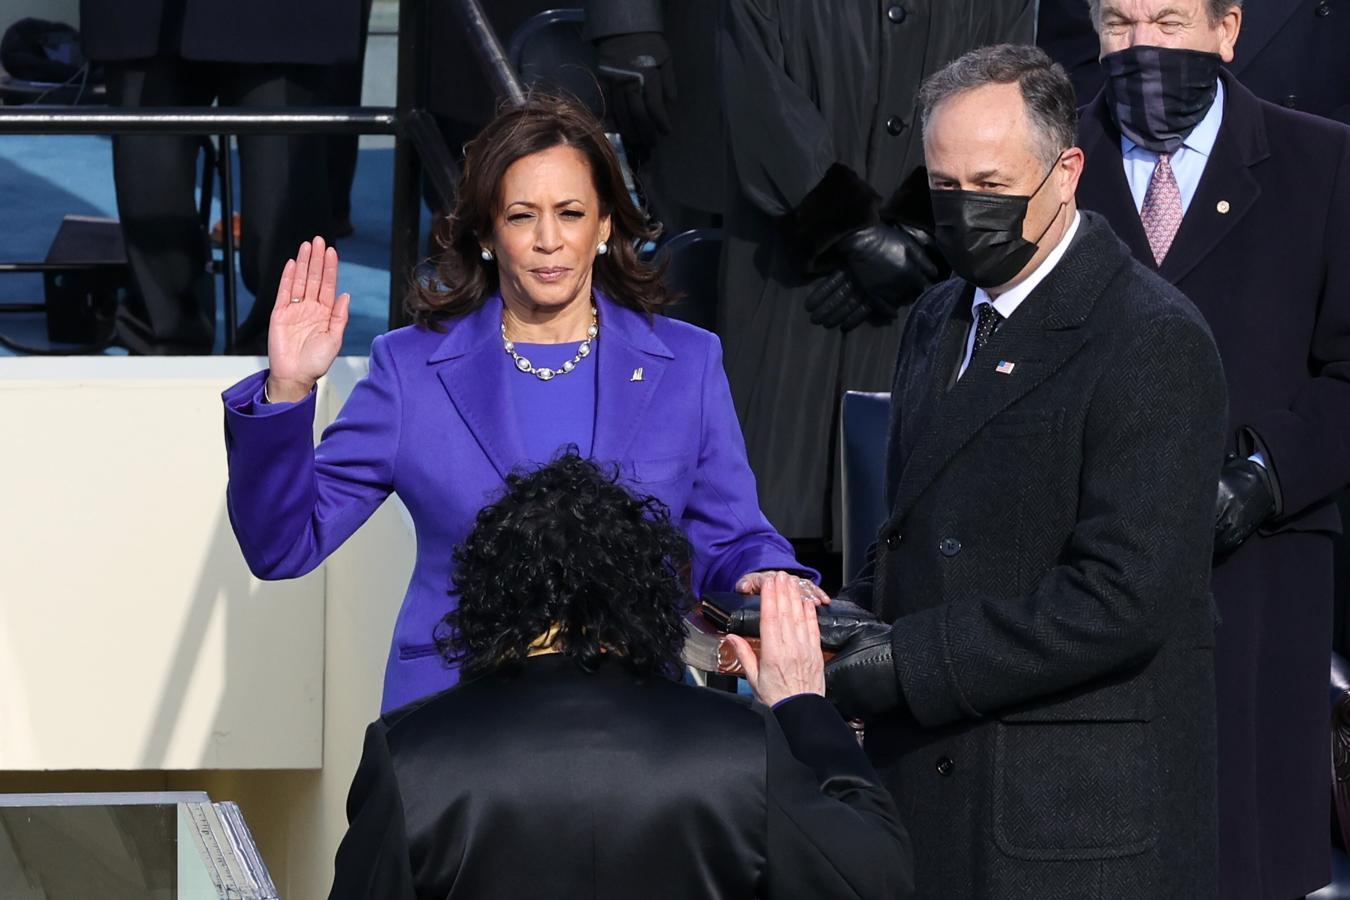 Momento en el que Kamala Harris ha jurado como vicepresidenta